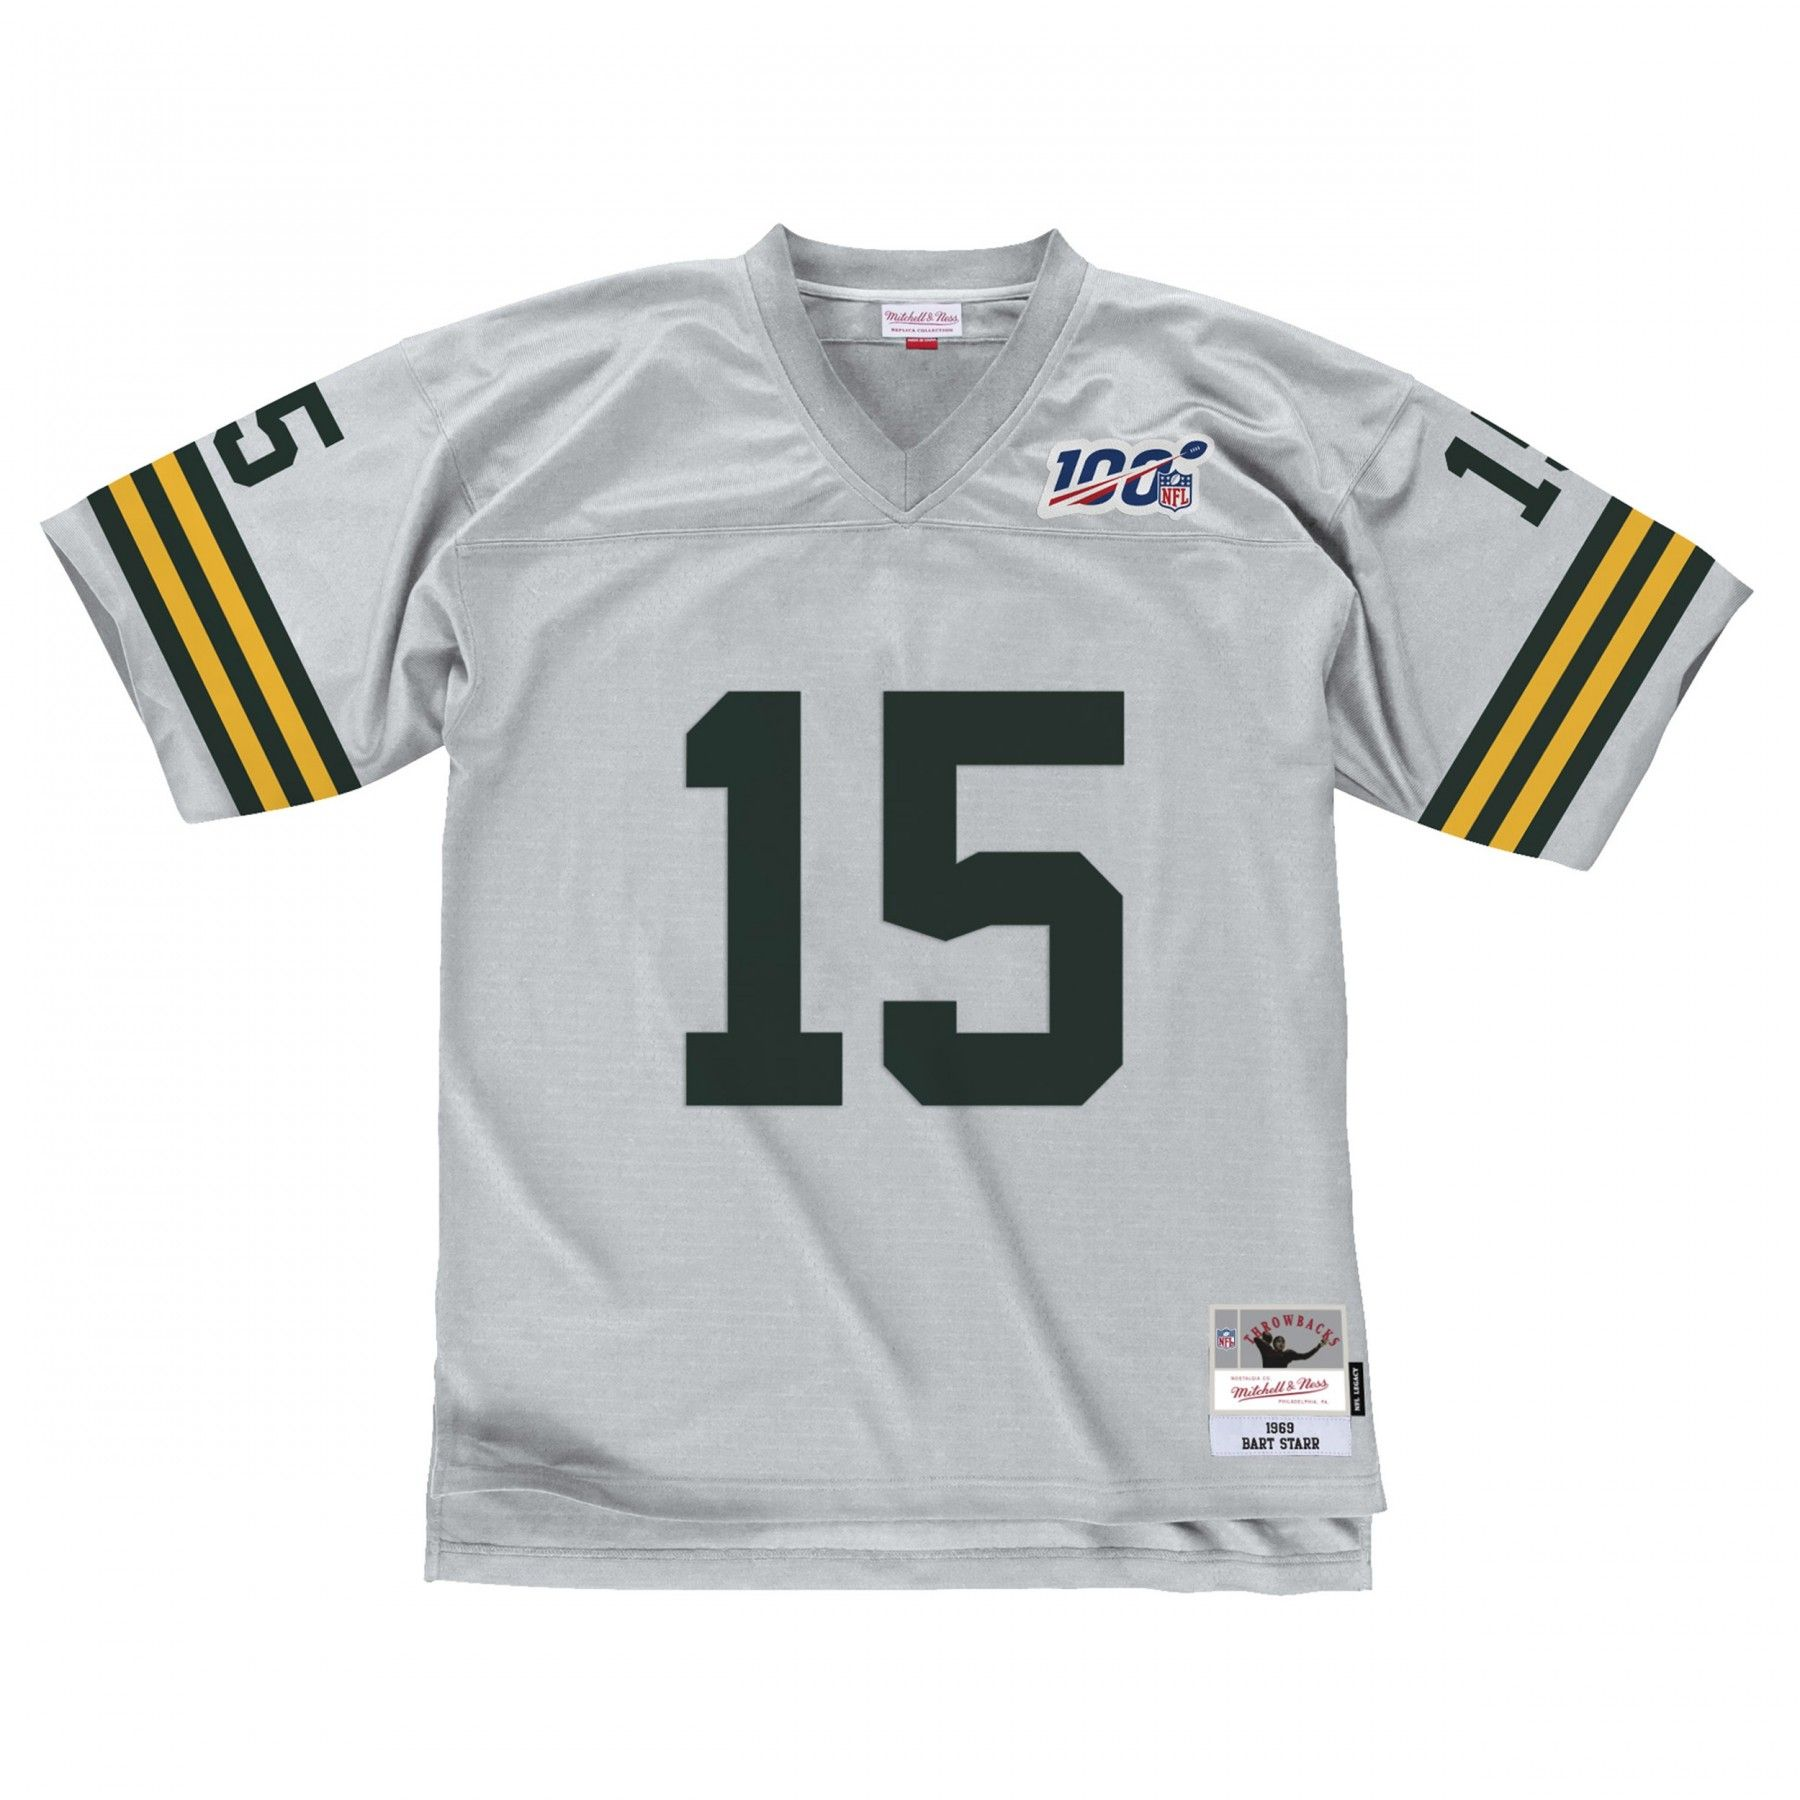 Pin by fashion...inc on uptown jerseys!!! | Jersey, Nfl, Bart starr